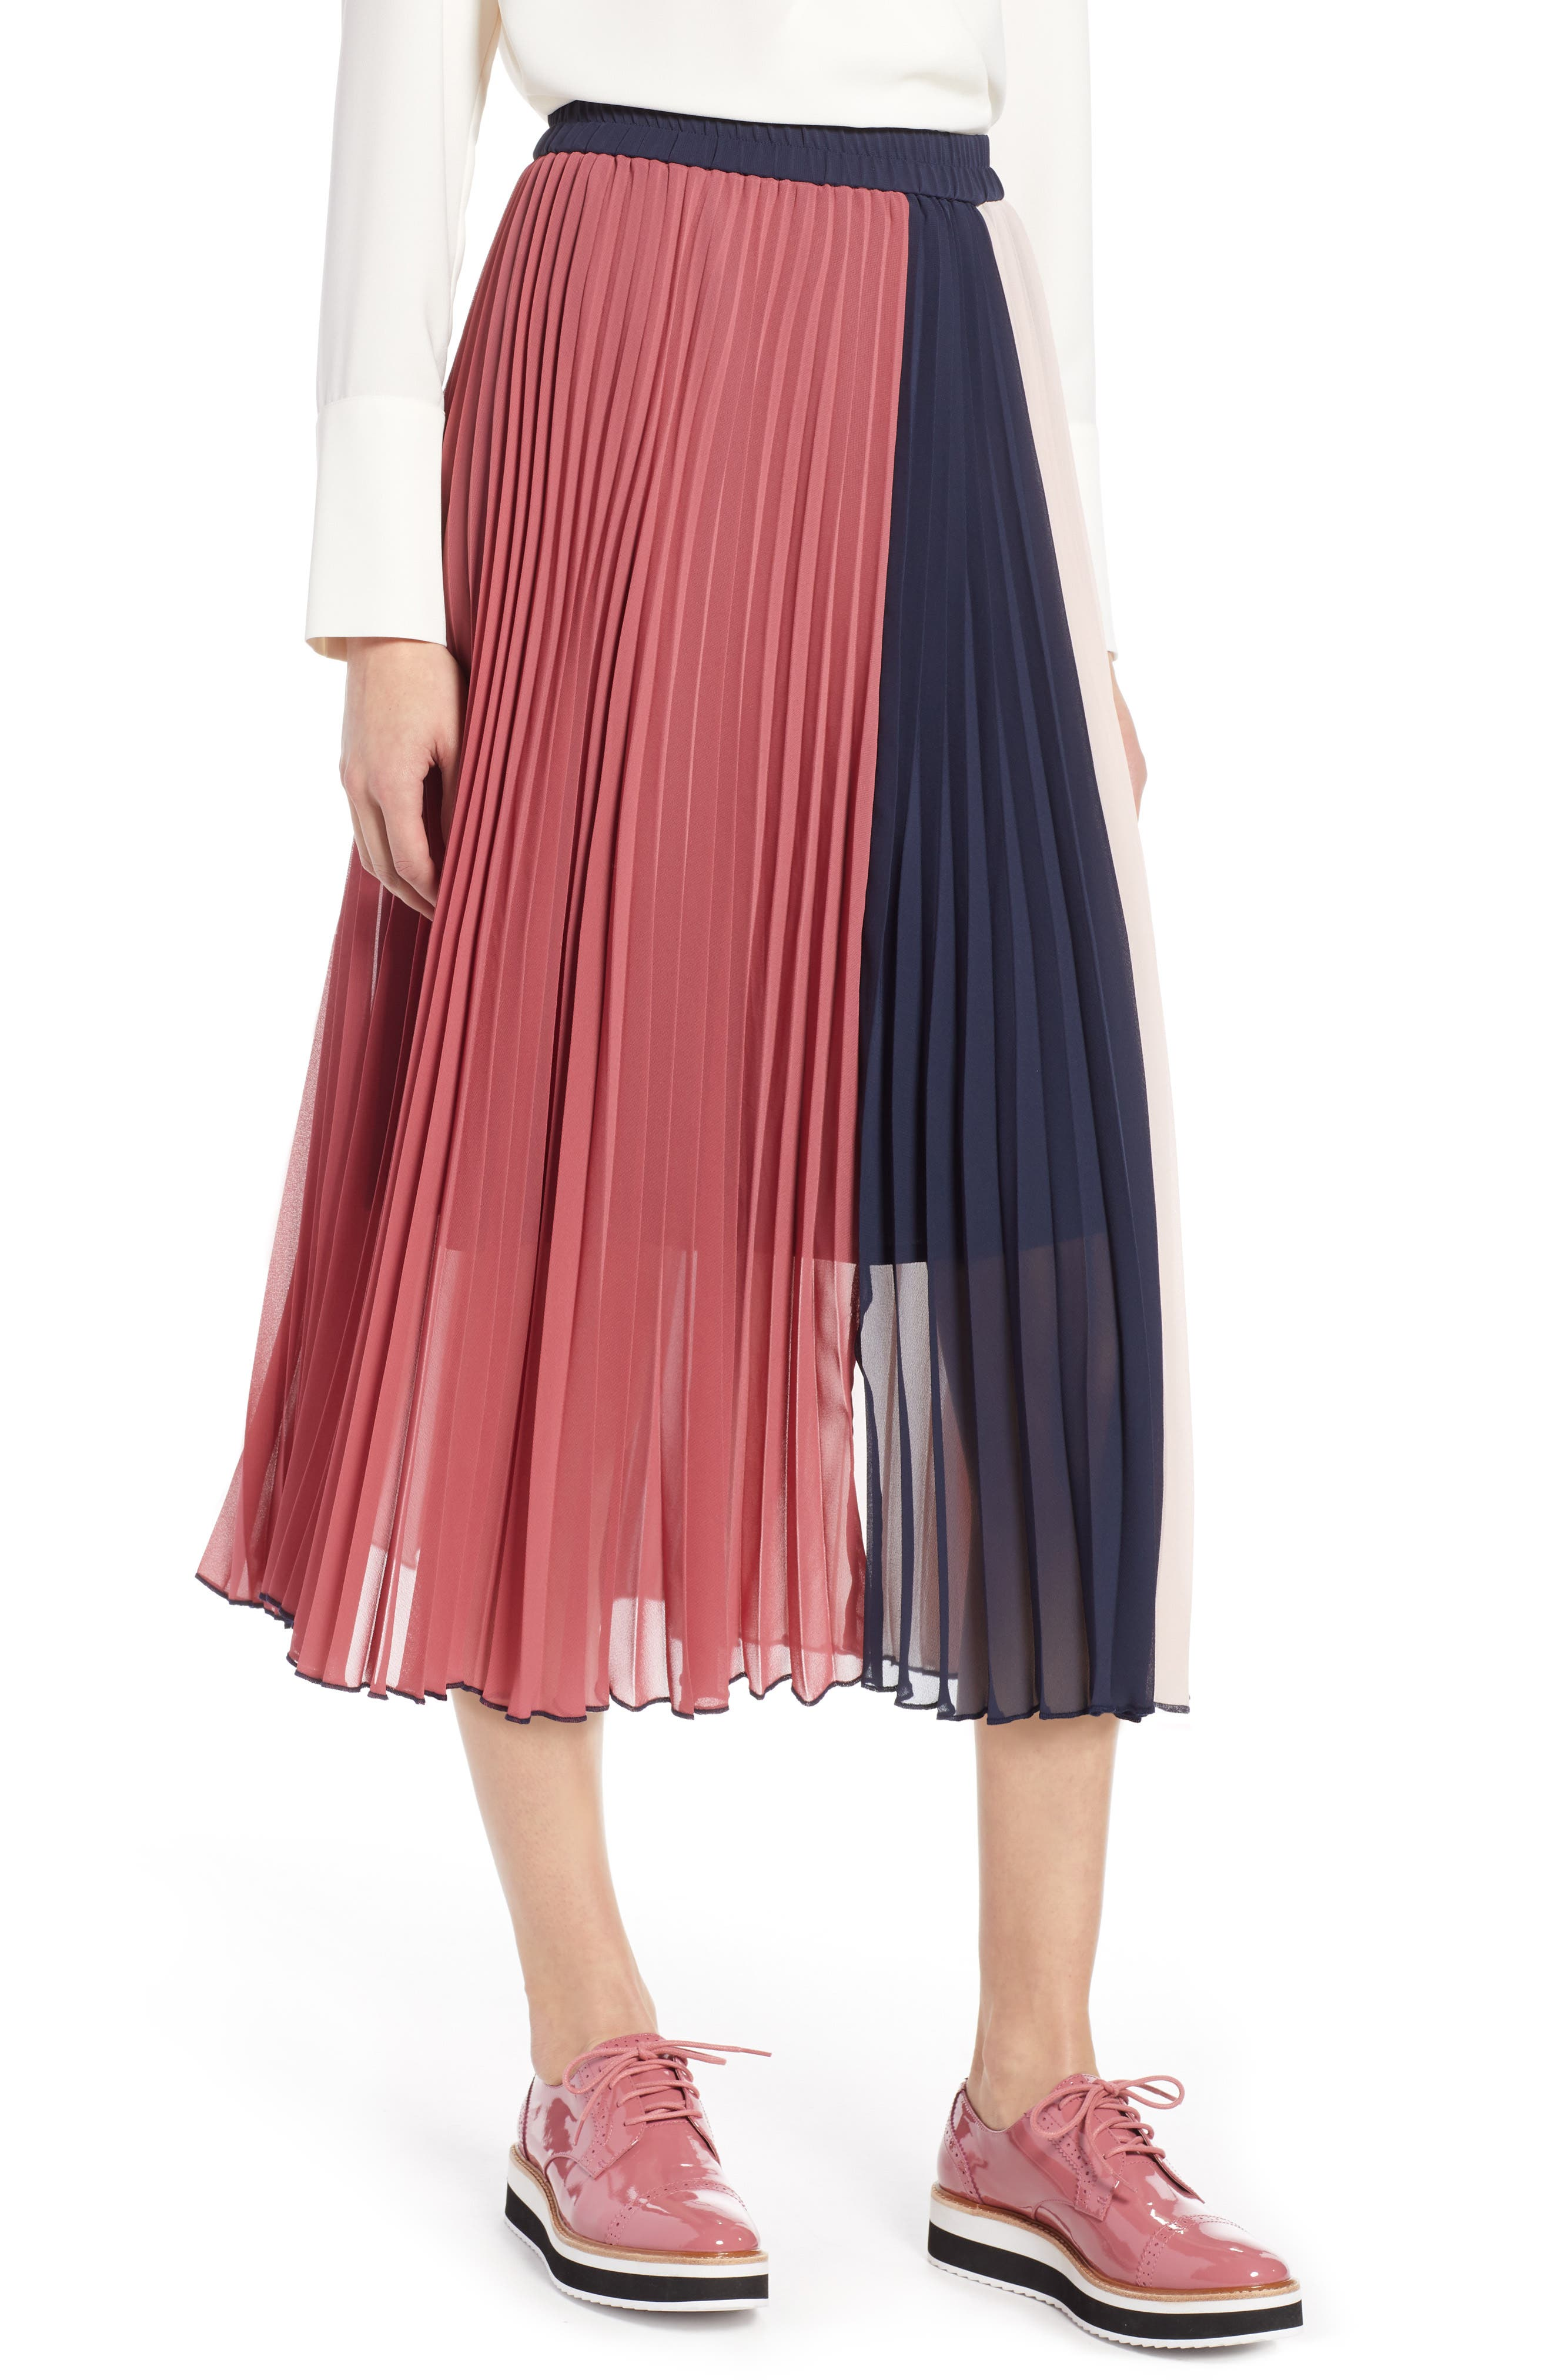 Halogen X Atlantic-Pacific Colorblock Pleated Midi Skirt, Pink